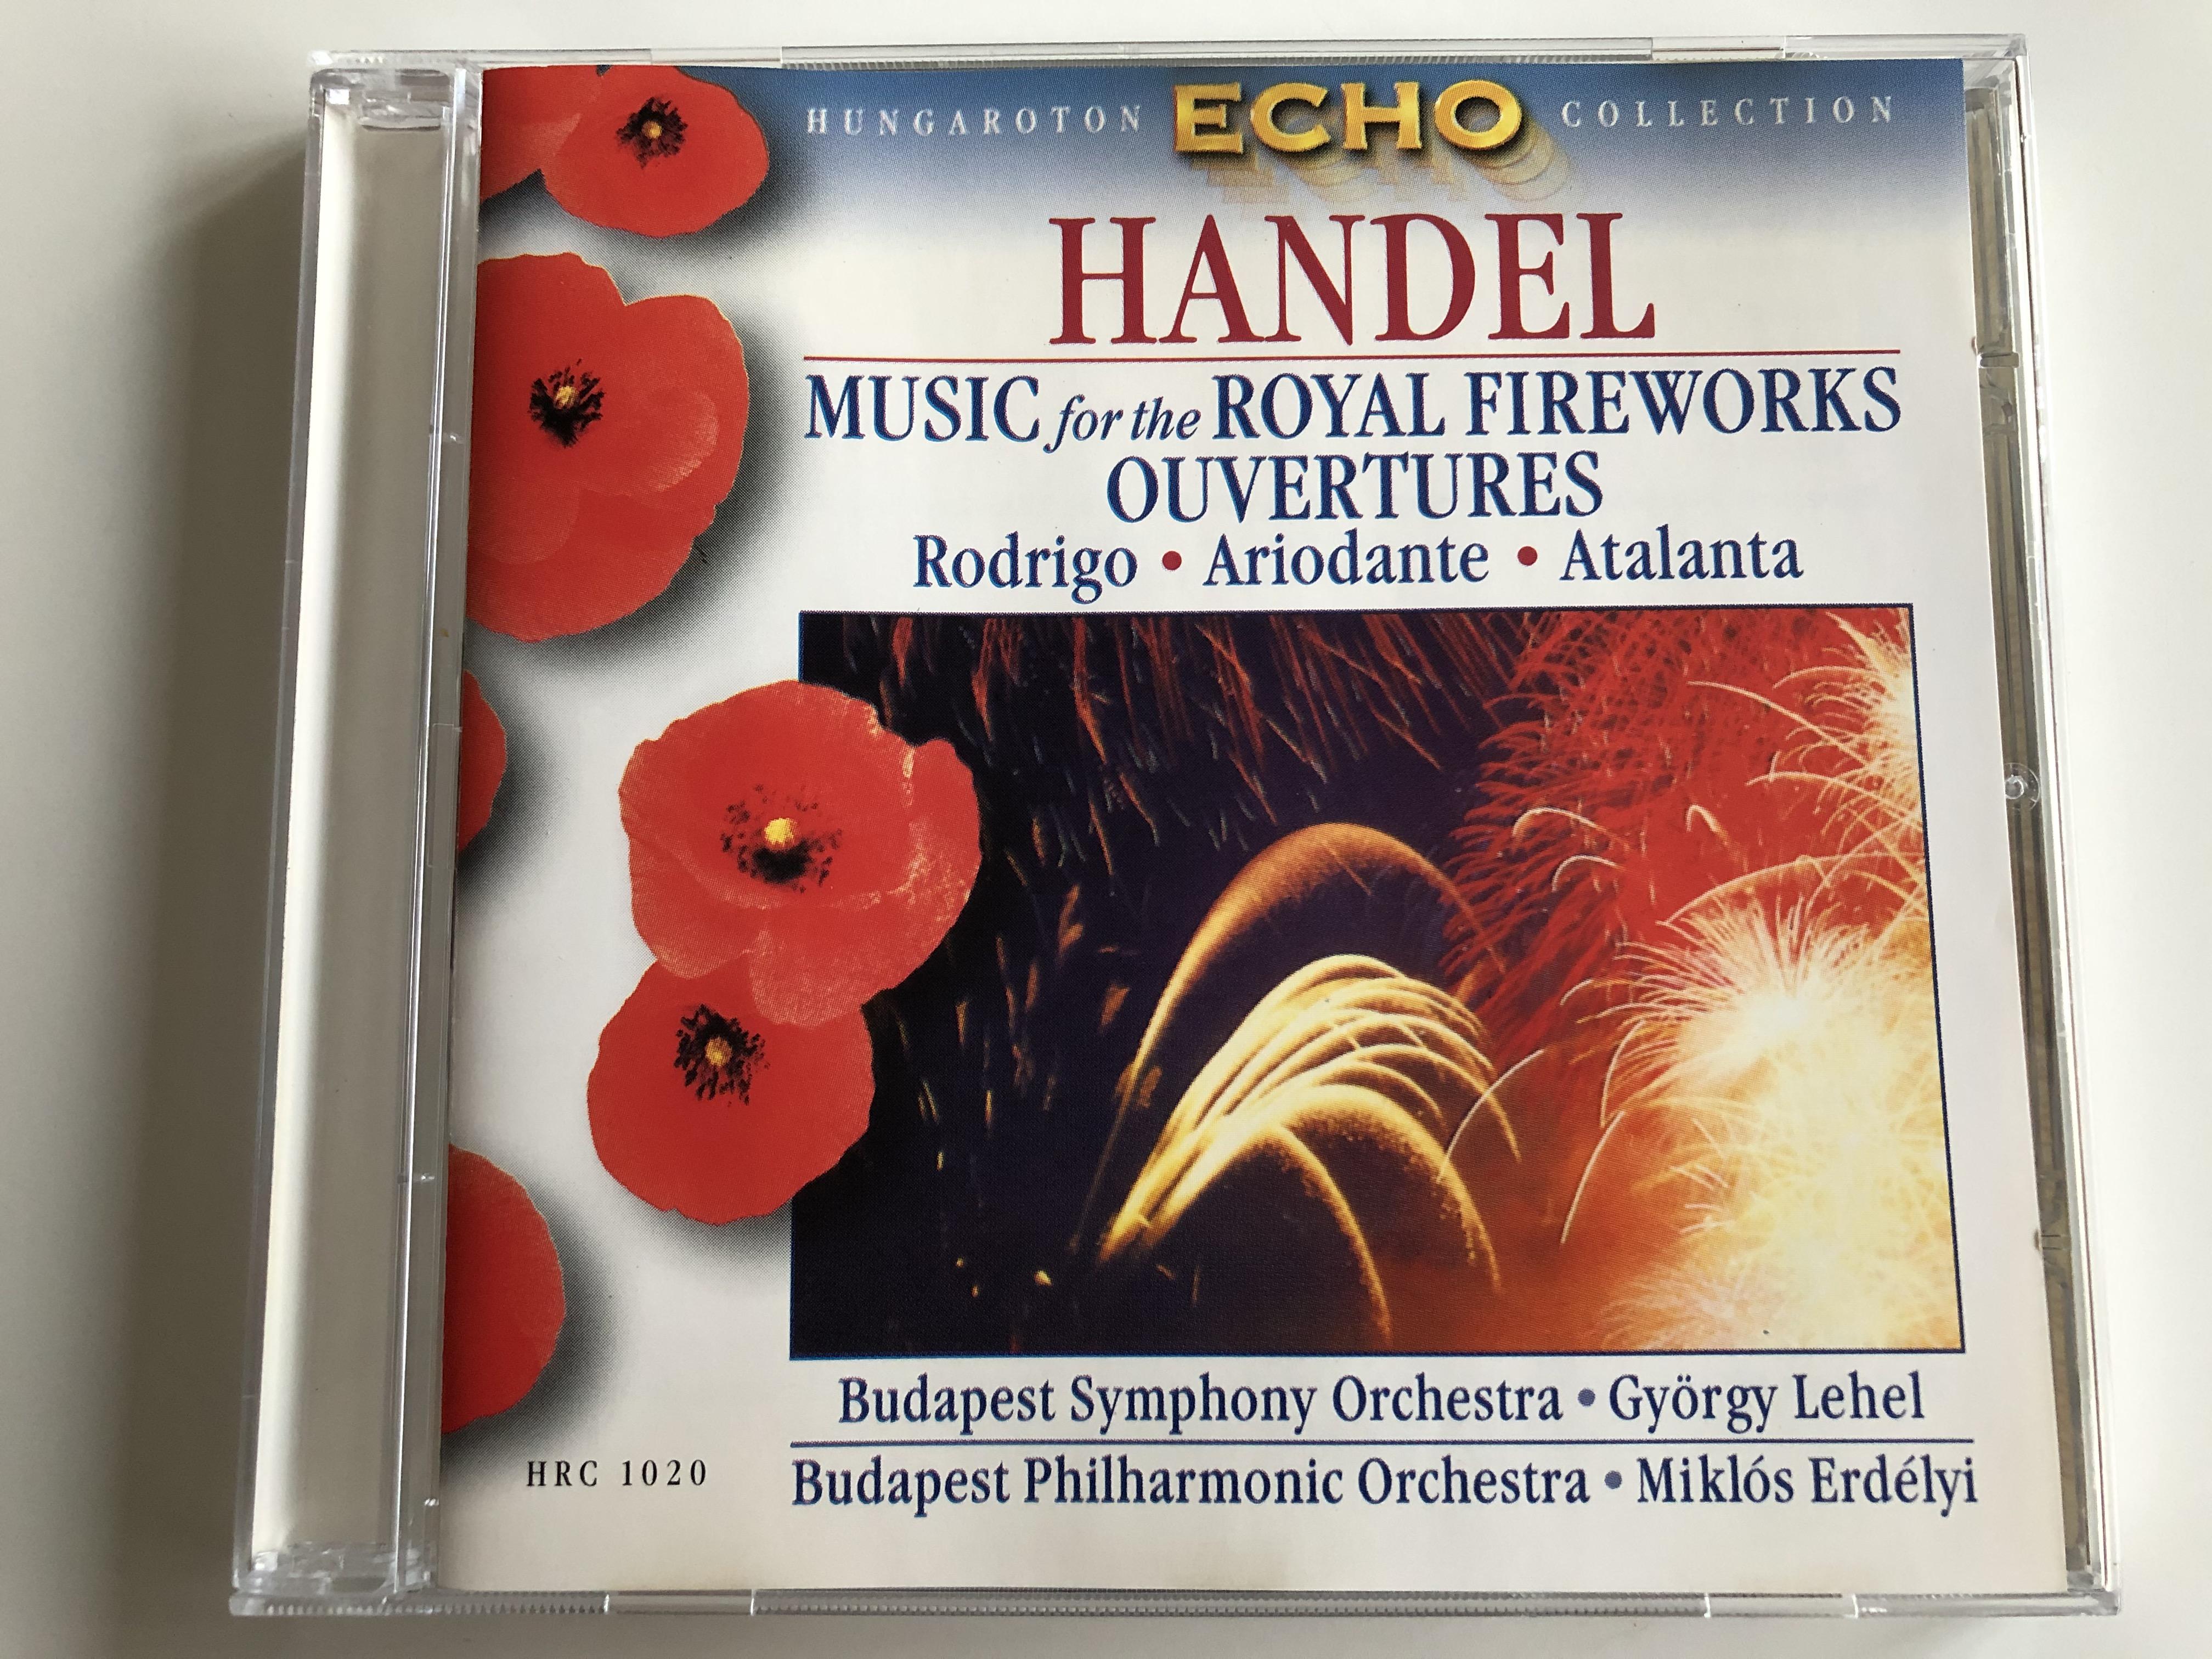 h-ndel-music-for-the-royal-fireworks-ouvertures-rodrigo-ariodante-atalanta-budapest-symphony-orchestra-gy-rgy-lehel-budapest-philharmonic-orchestra-mikl-s-erd-lyi-hungaroton-classic-au-1-.jpg